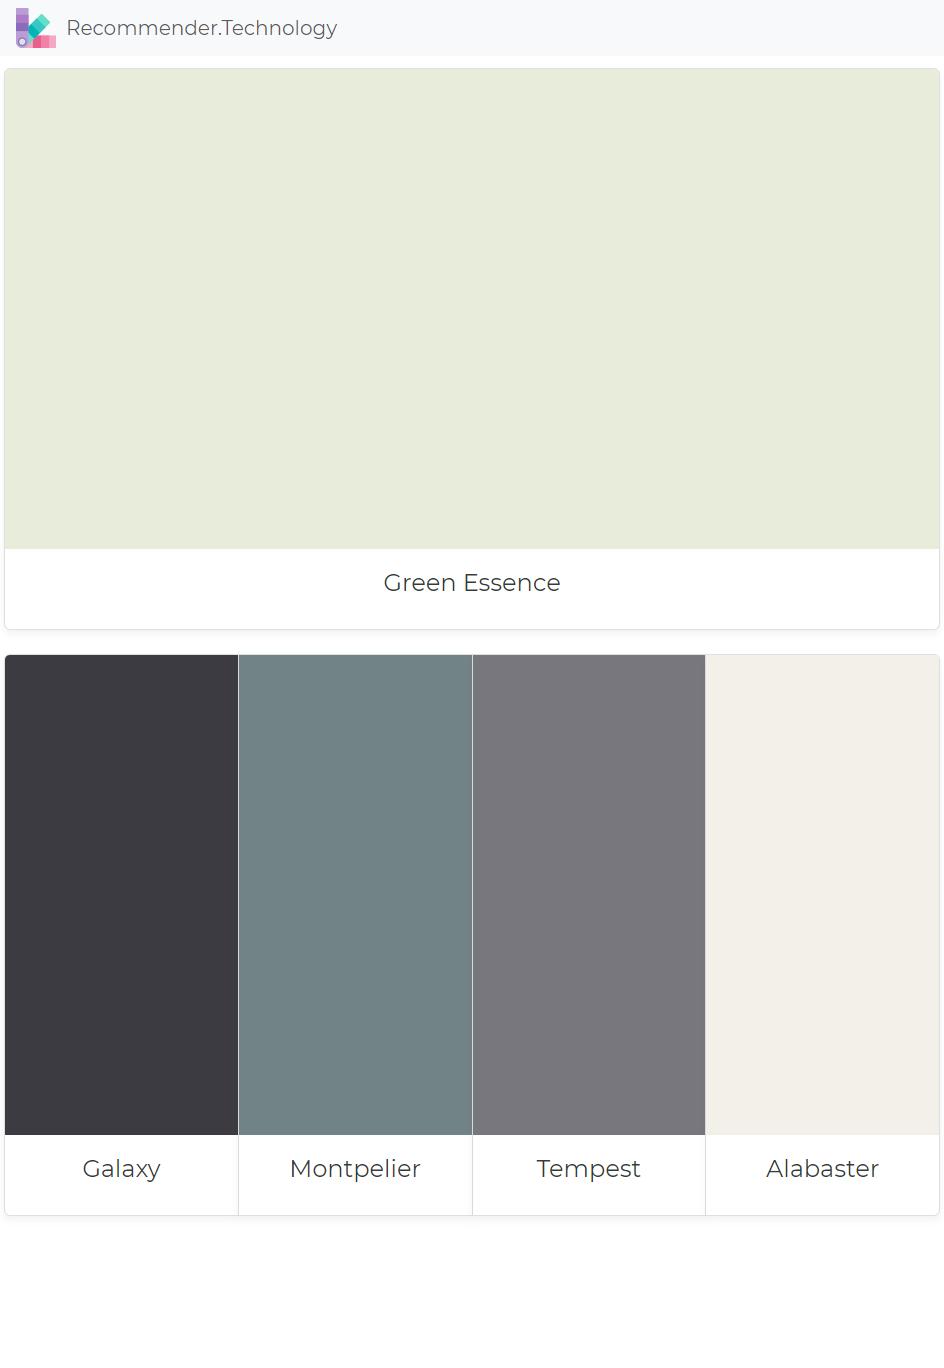 Lowes Ponytail Paint Color - MILKA INFO